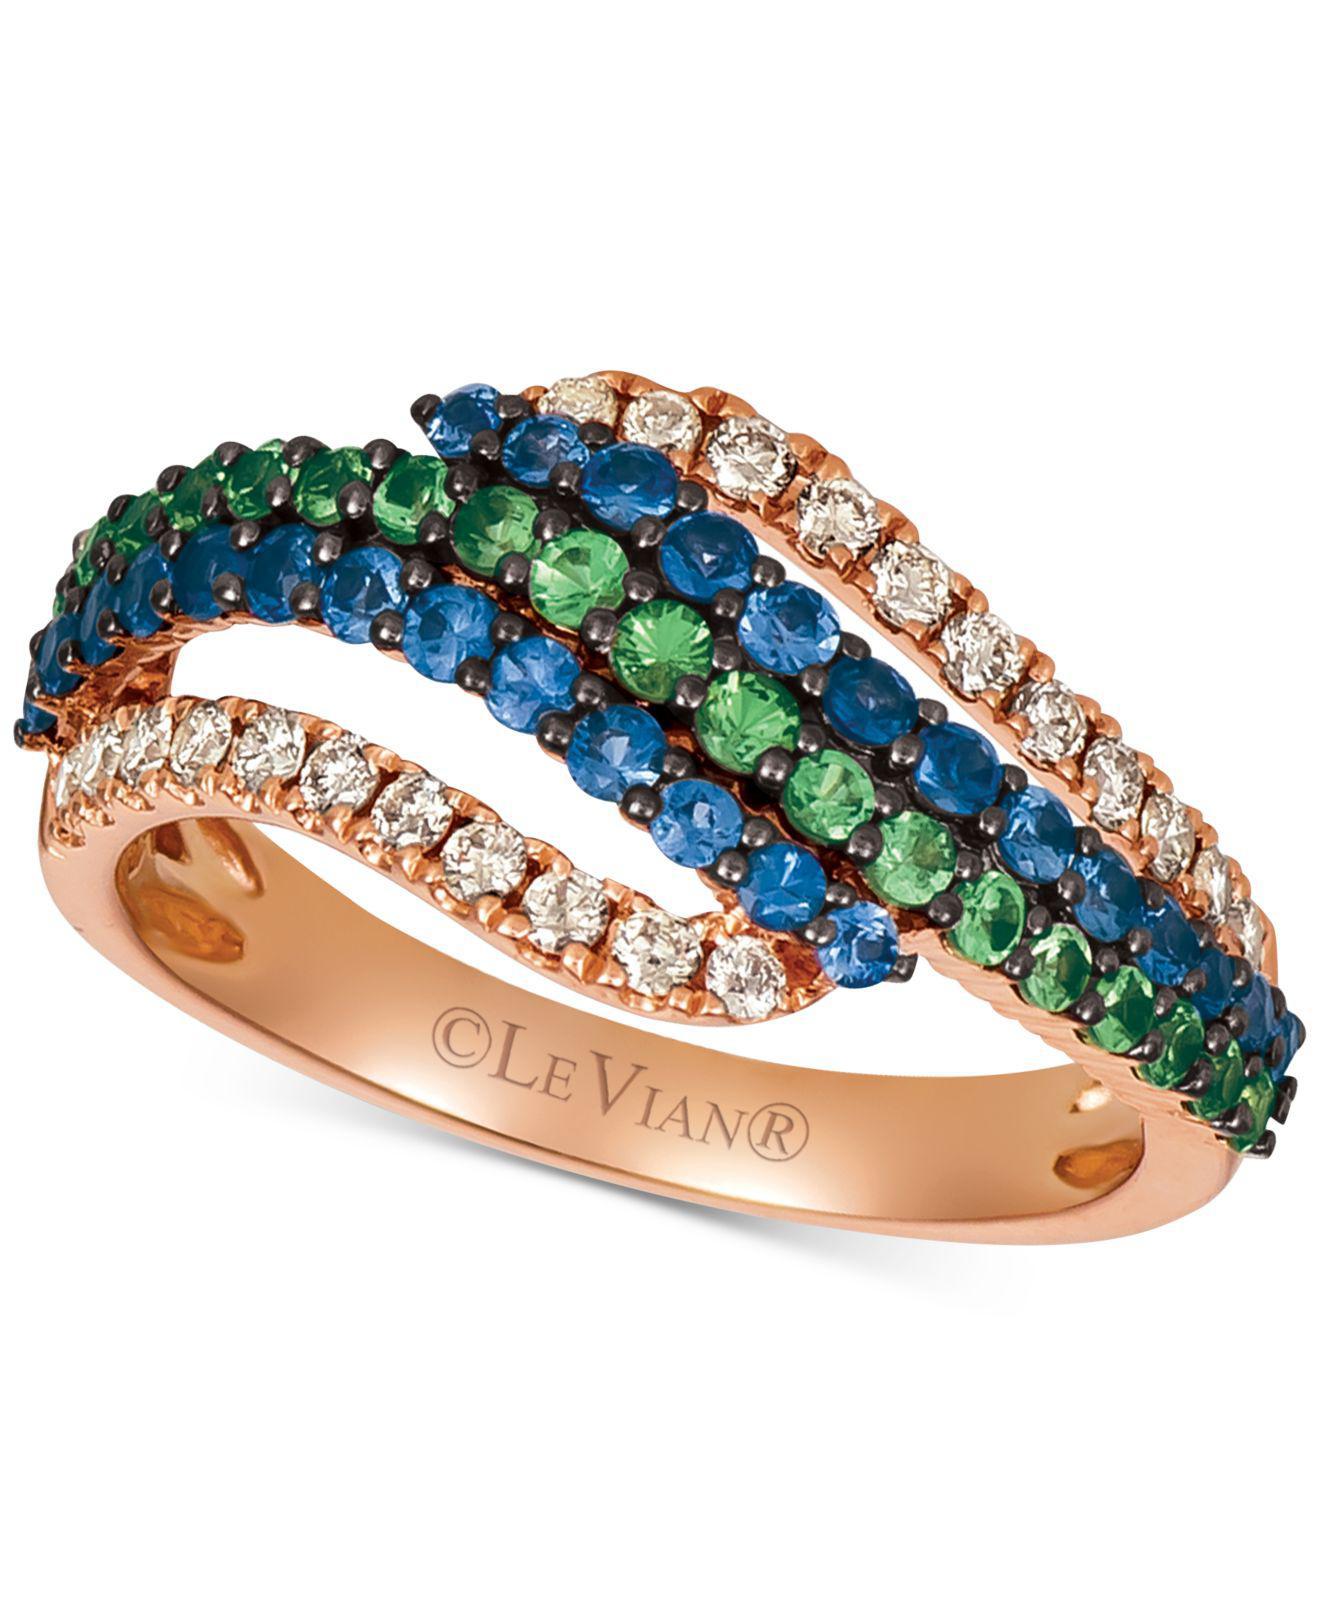 Le Vian Nude Diamond™ Statement Ring (5/8 ct. t.w.) in 14k